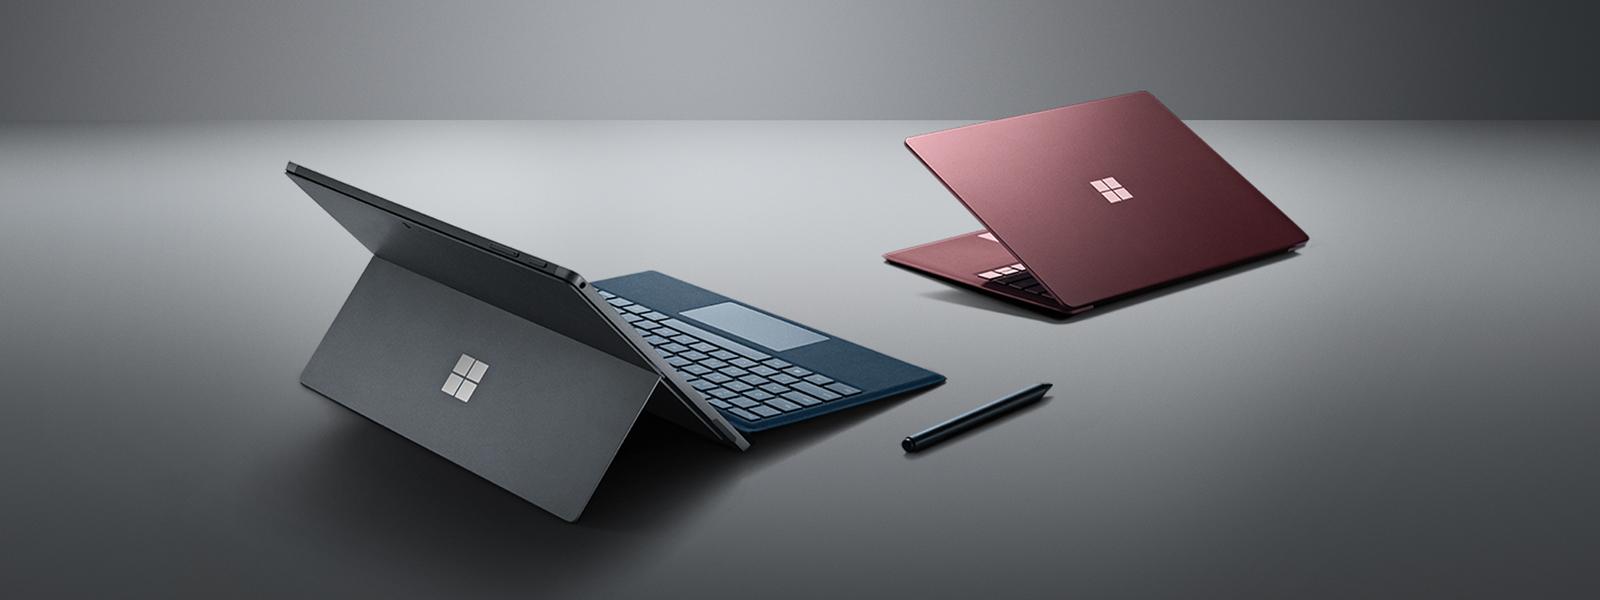 Surface Laptop 2, Surface Pro 6